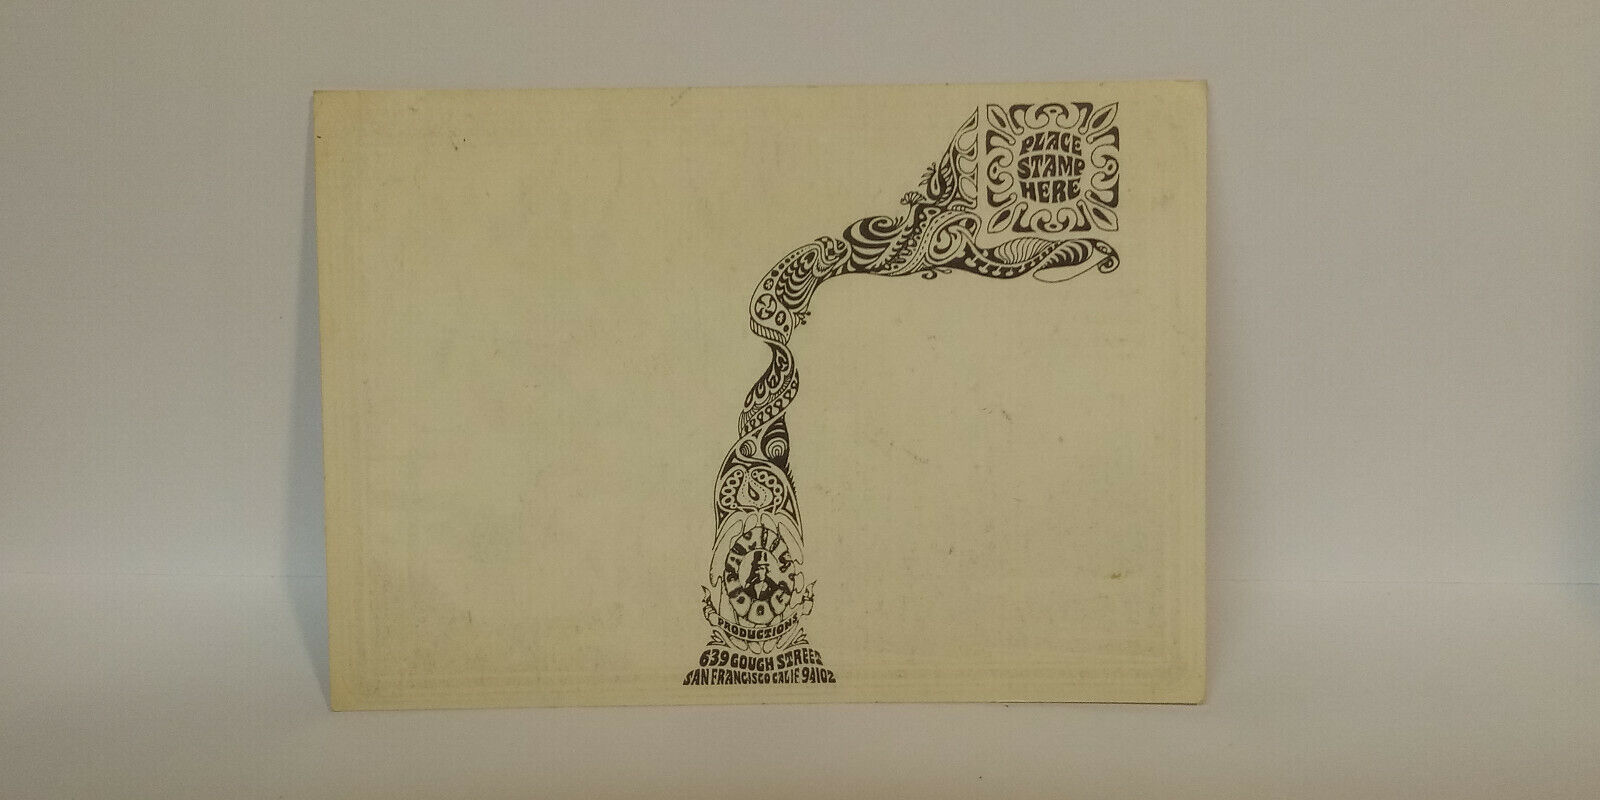 John MaYaLL Big Mama Thornton AVaLon BaLLrOOm FD137 1968 PoStcard - $9.95